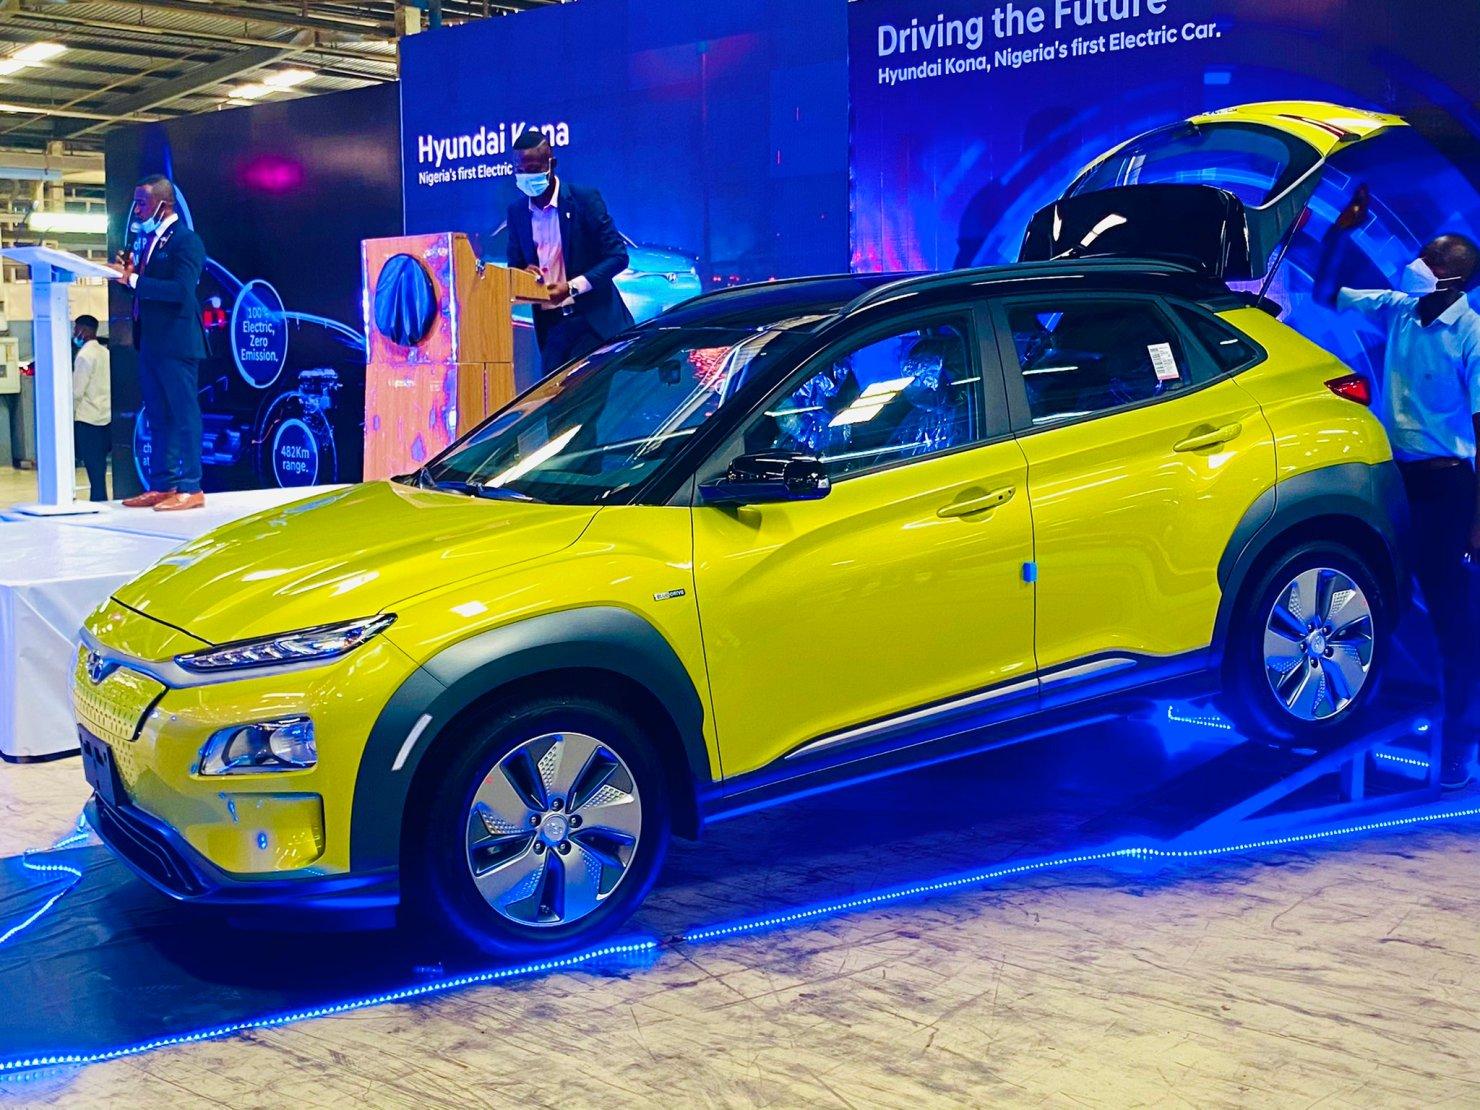 Lagos Governor unveils first electric car in Nigeria,Hyundai Kona